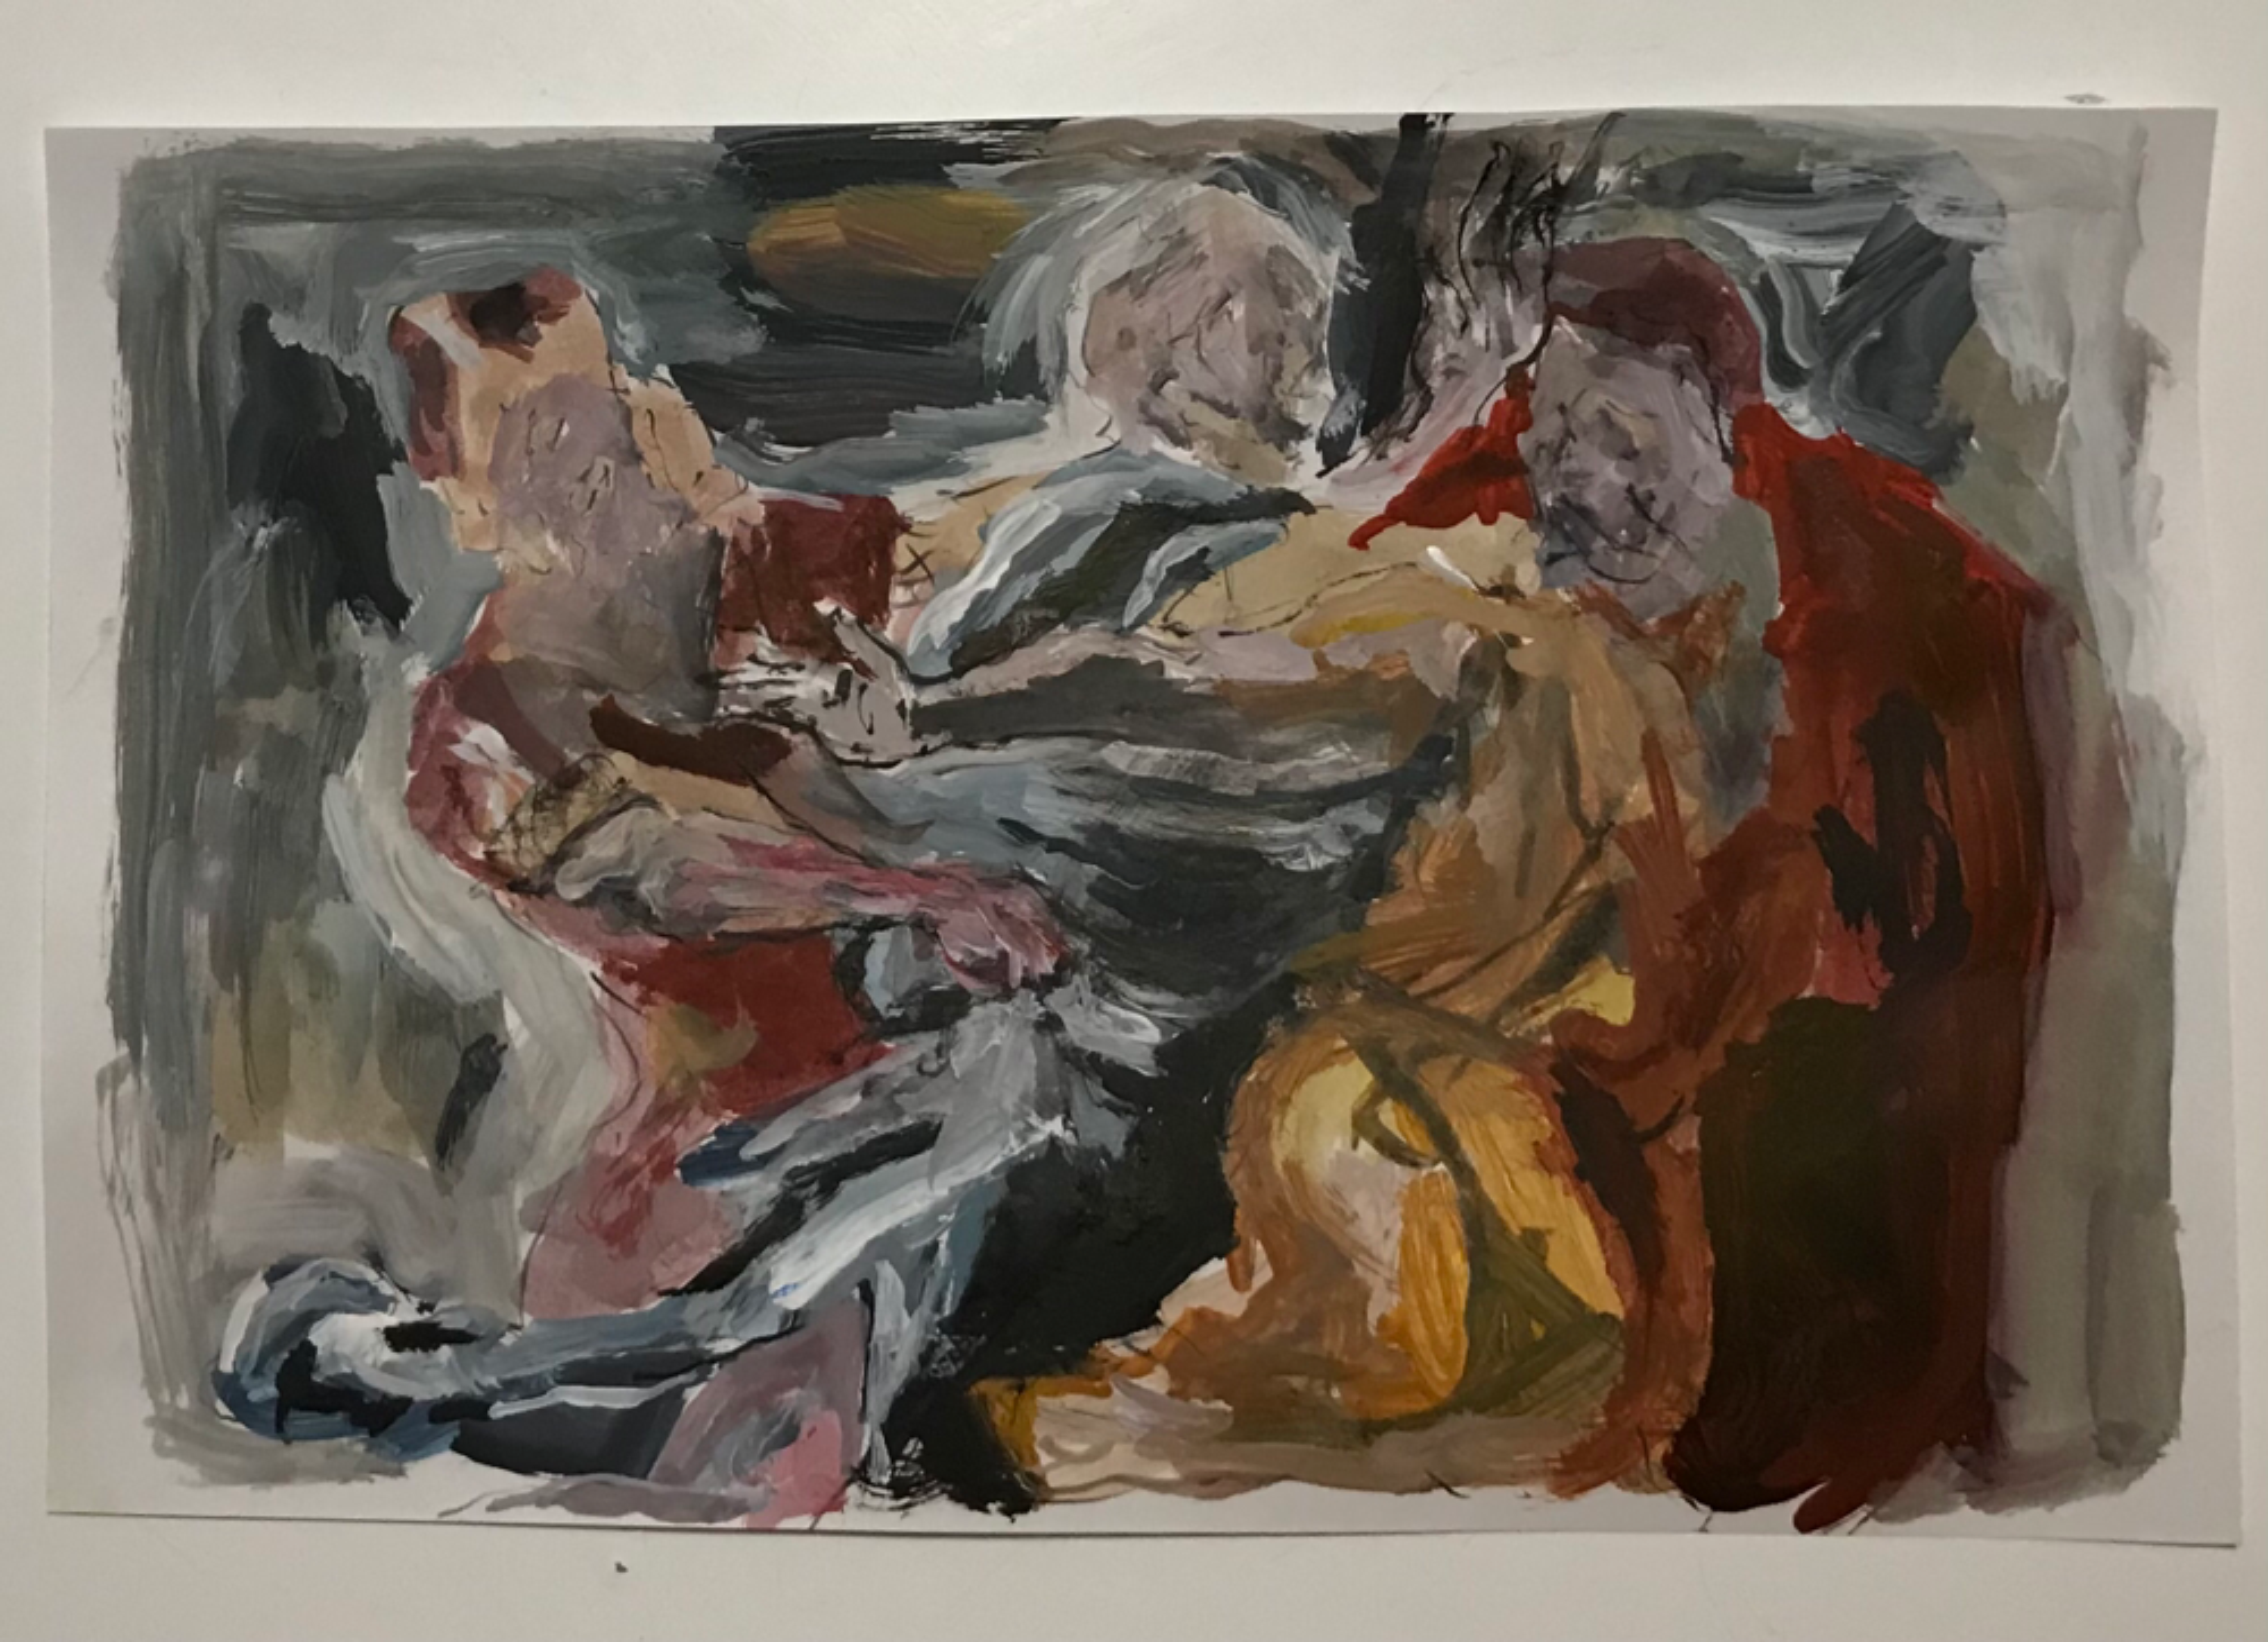 Untitled, paint on paper cm 20x30, 2021